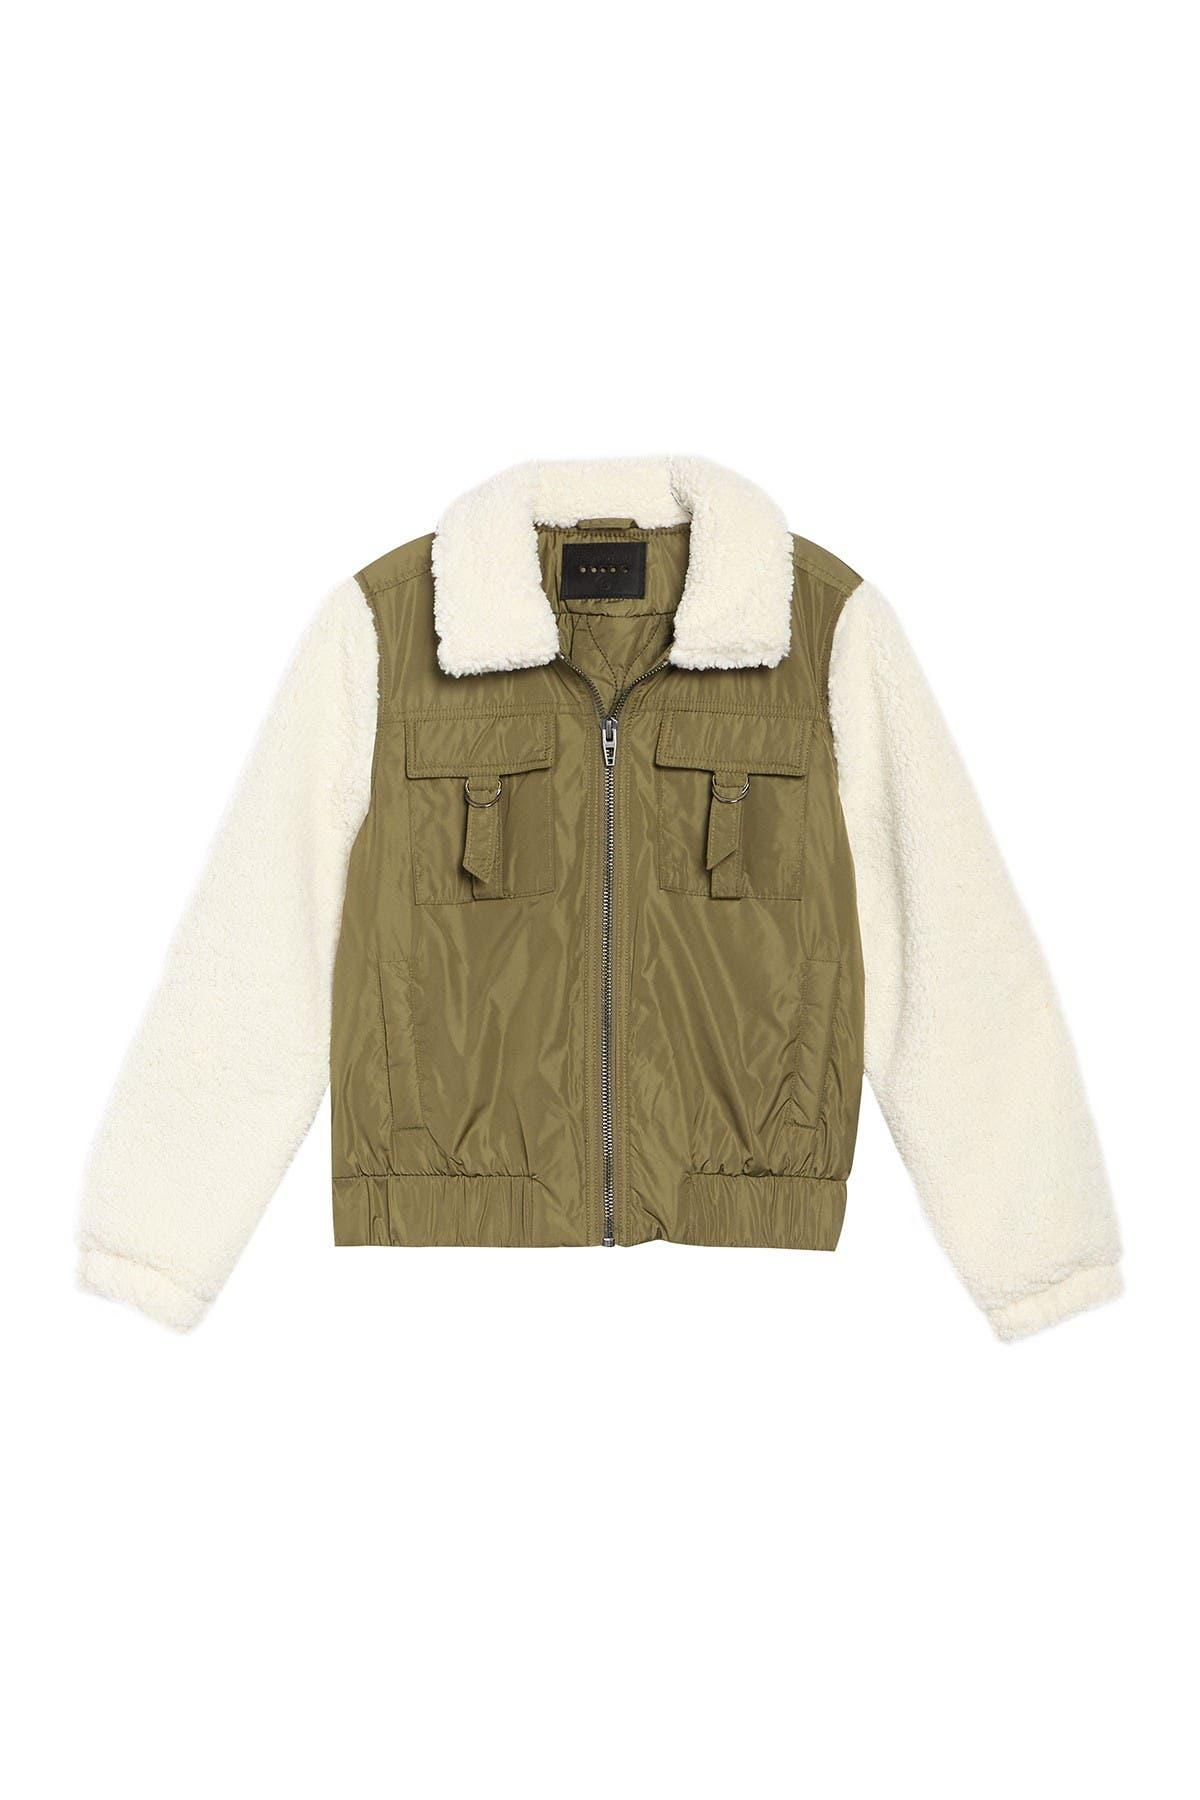 Image of BLANKNYC Denim Faux Shearling Sleeve Utility Bomber Jacket